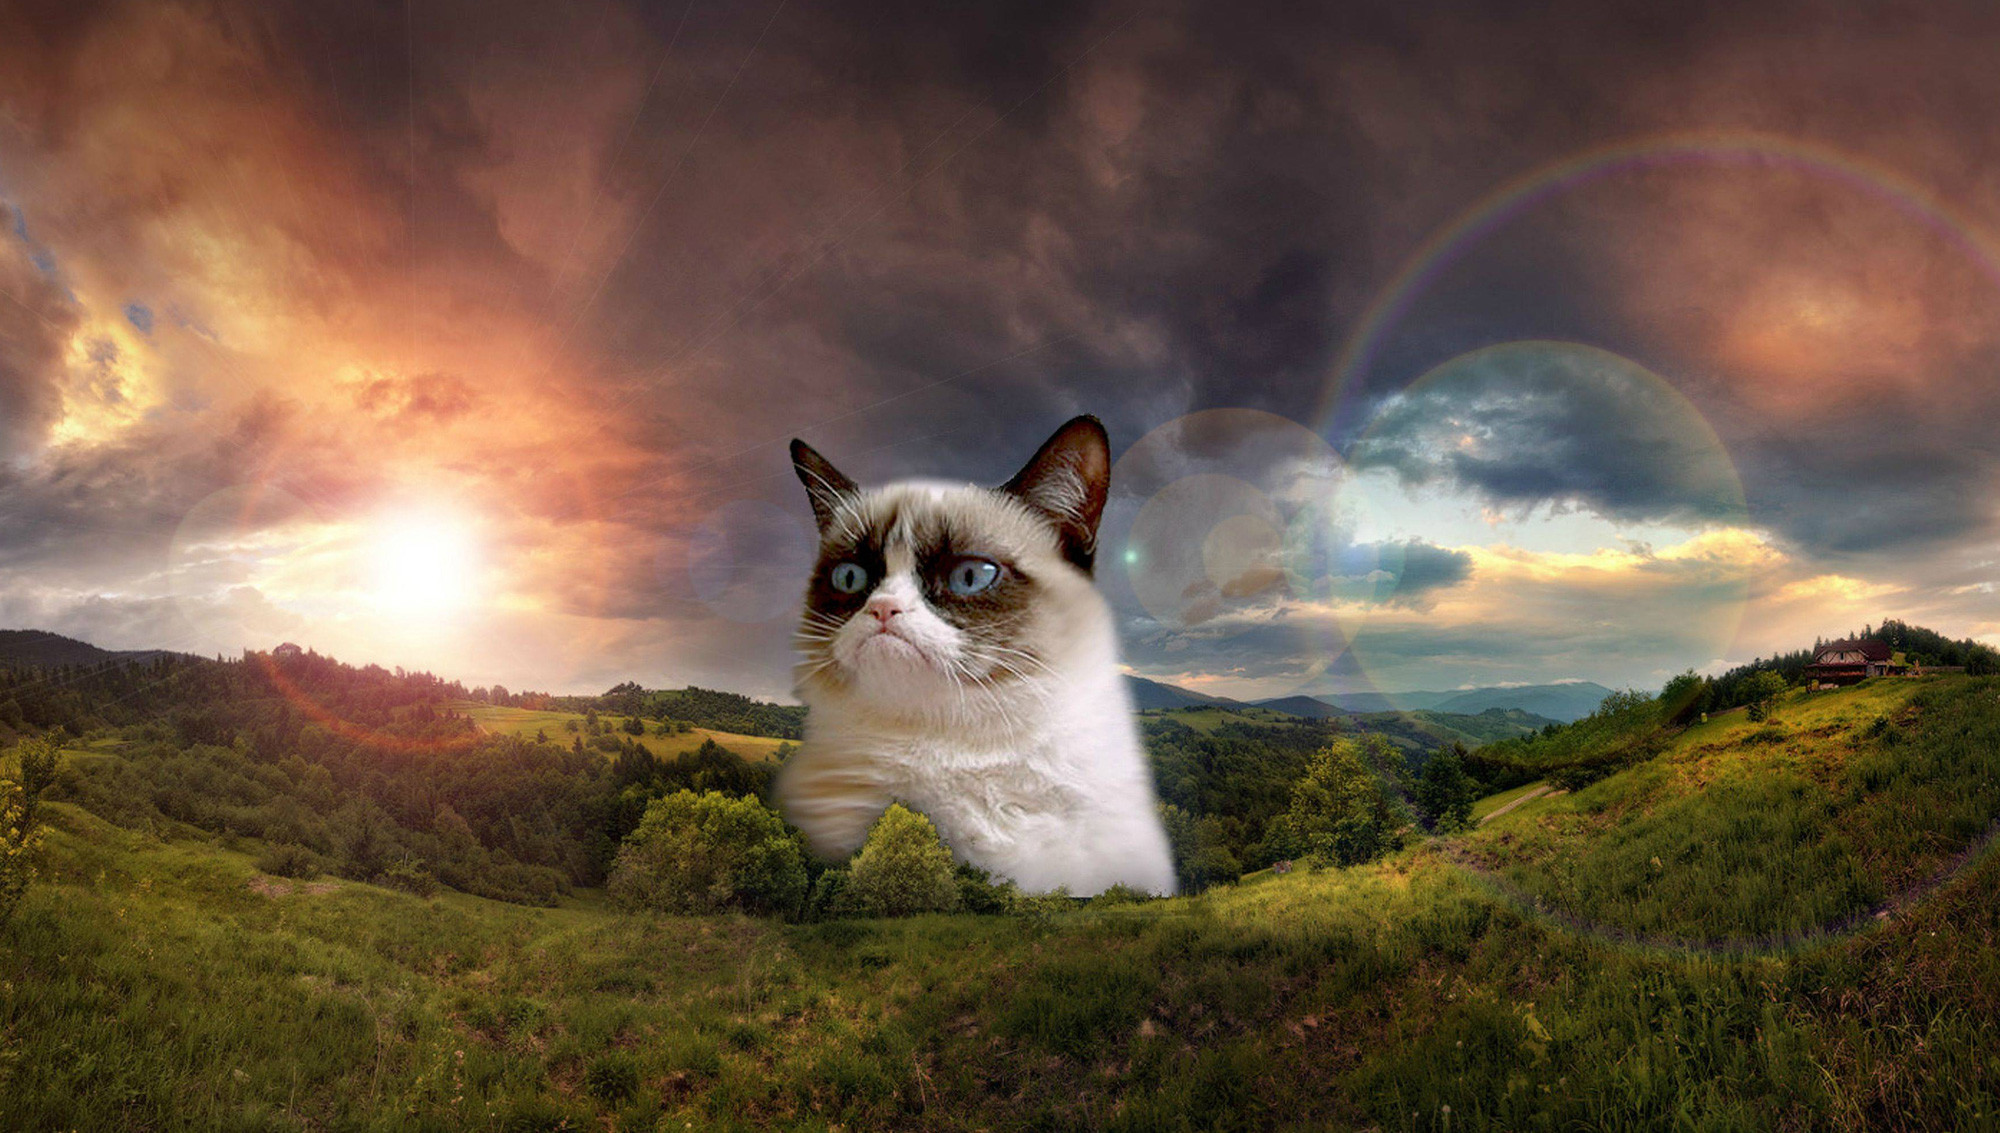 Grumpy Cat Pictures HD Wallpaper 1080p